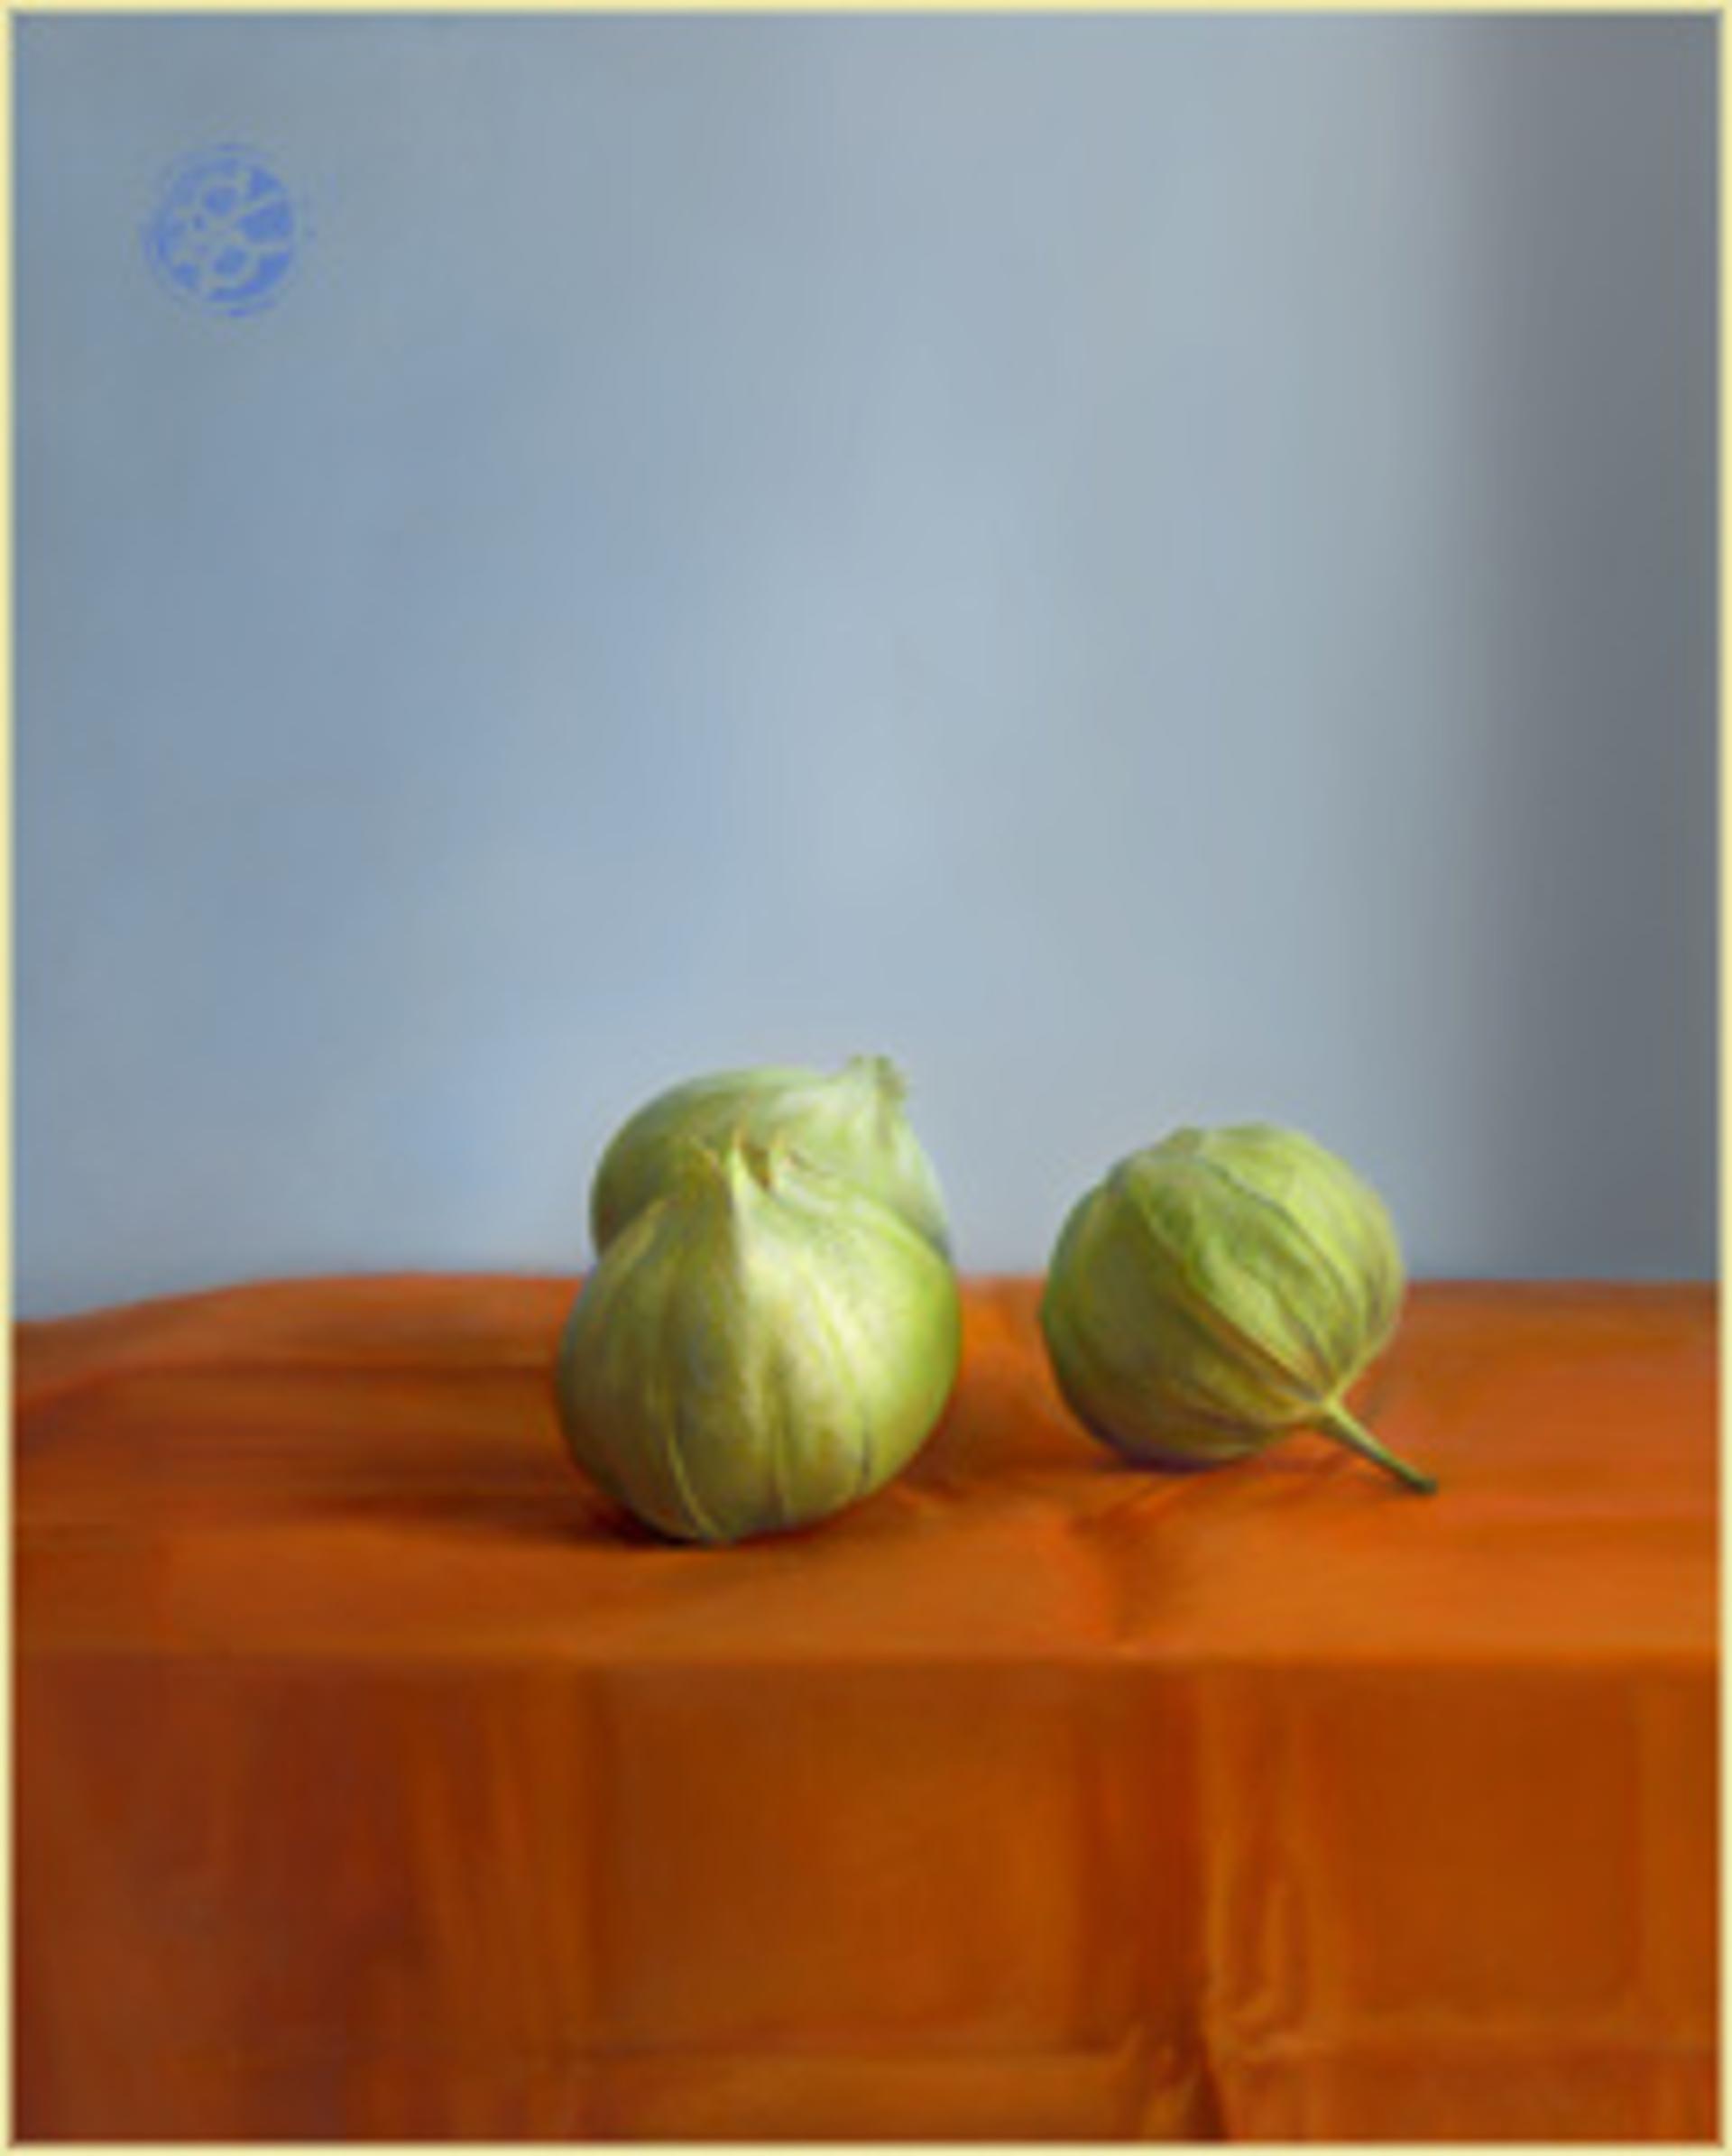 Tomatillos by Kate Sammons